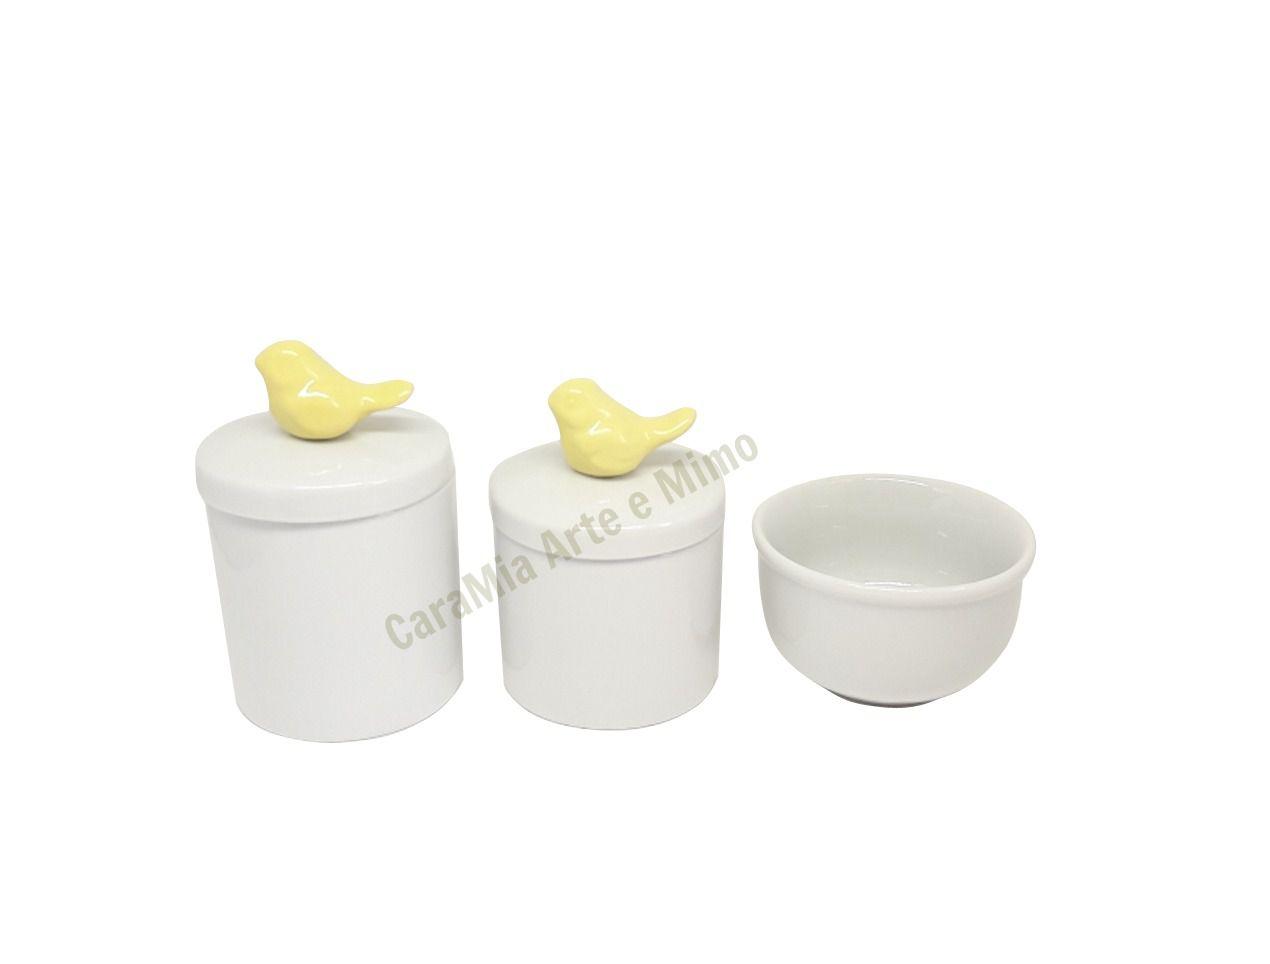 Kit Higiene Bebê Porcelana | Pássaros Amarelos| 3 peças